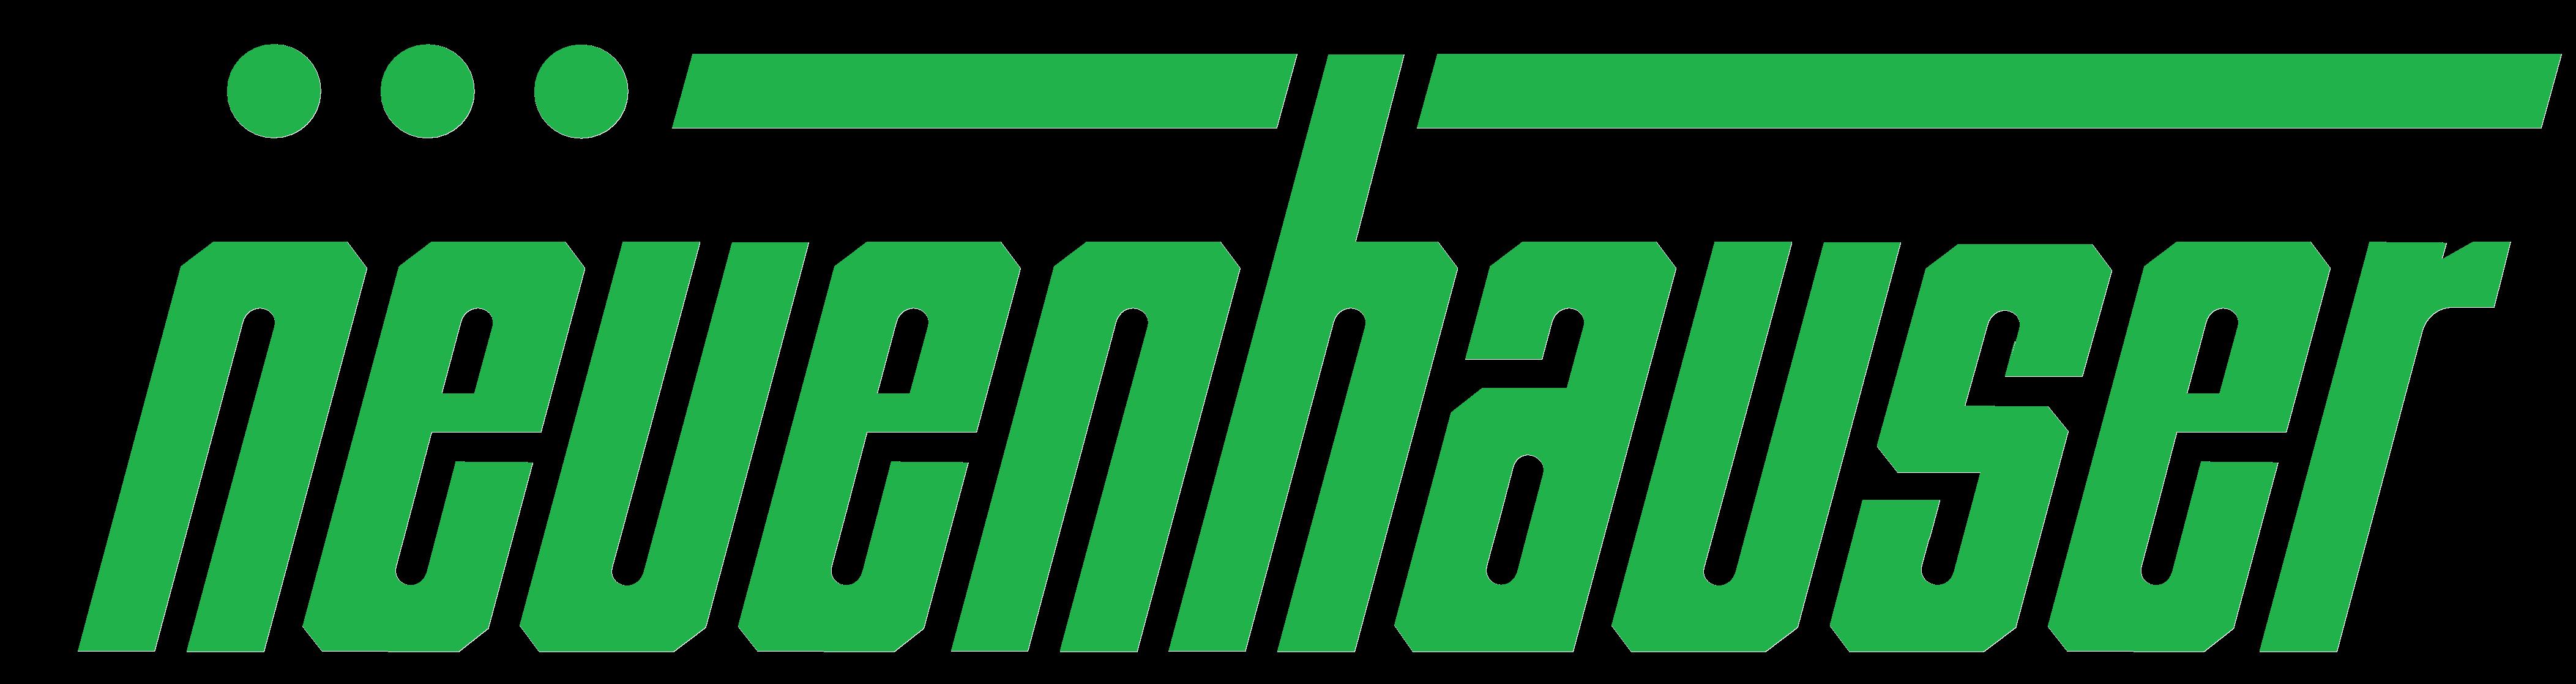 Neuenhauser Maschinenbau